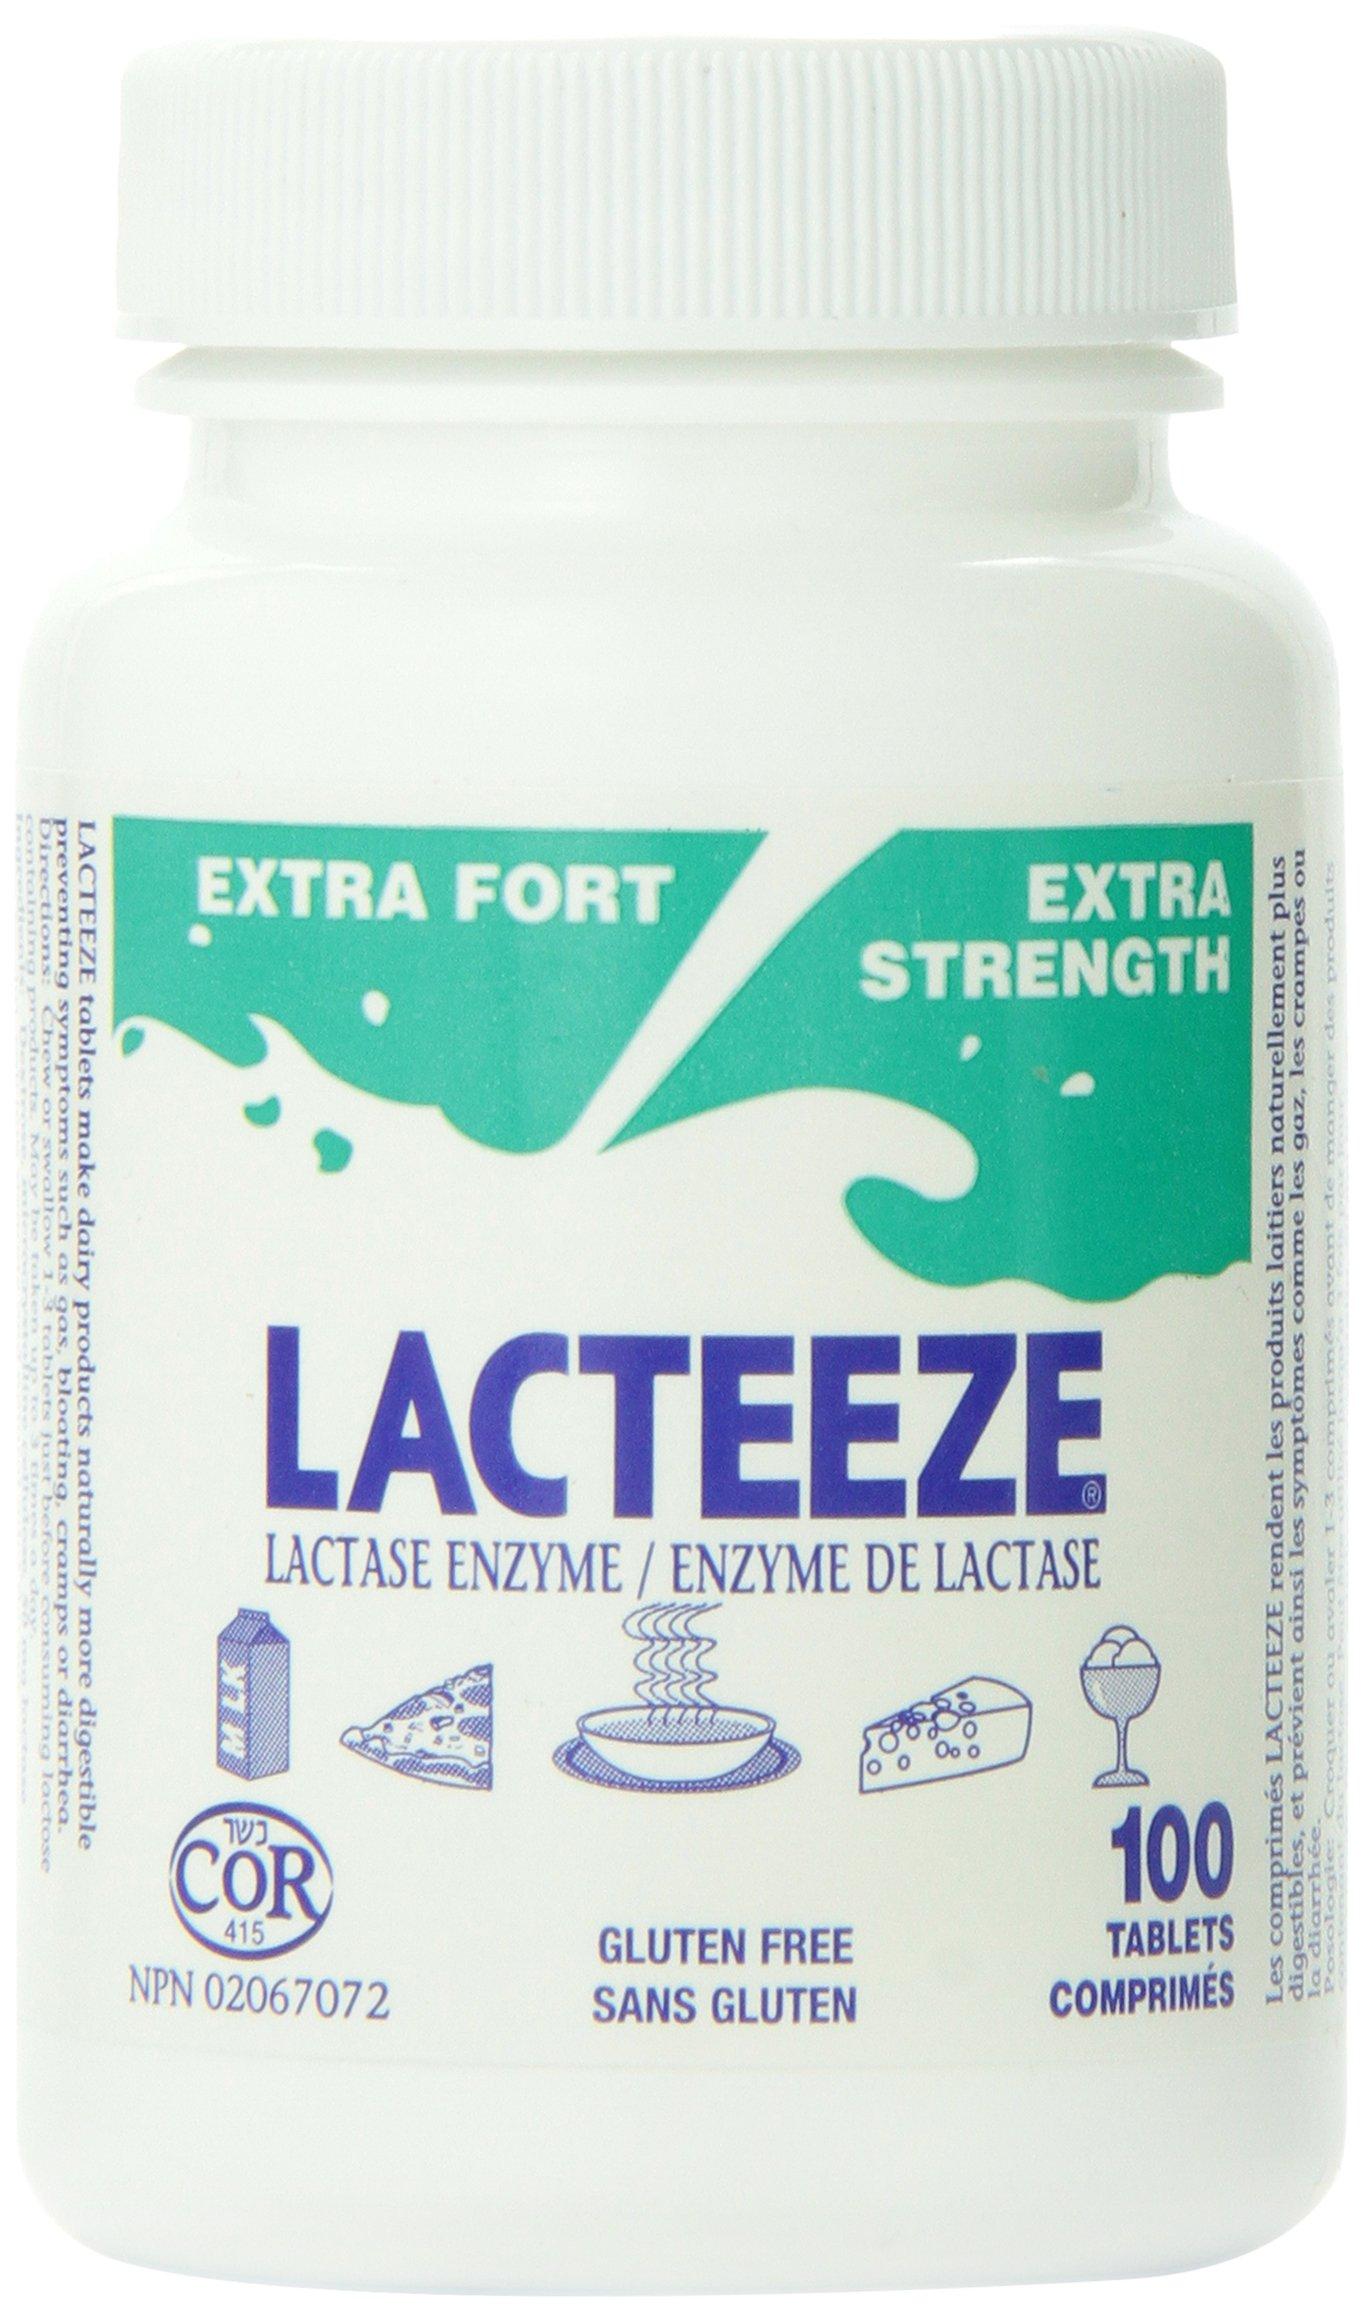 Lacteeze Extra Strength by Lacteeze